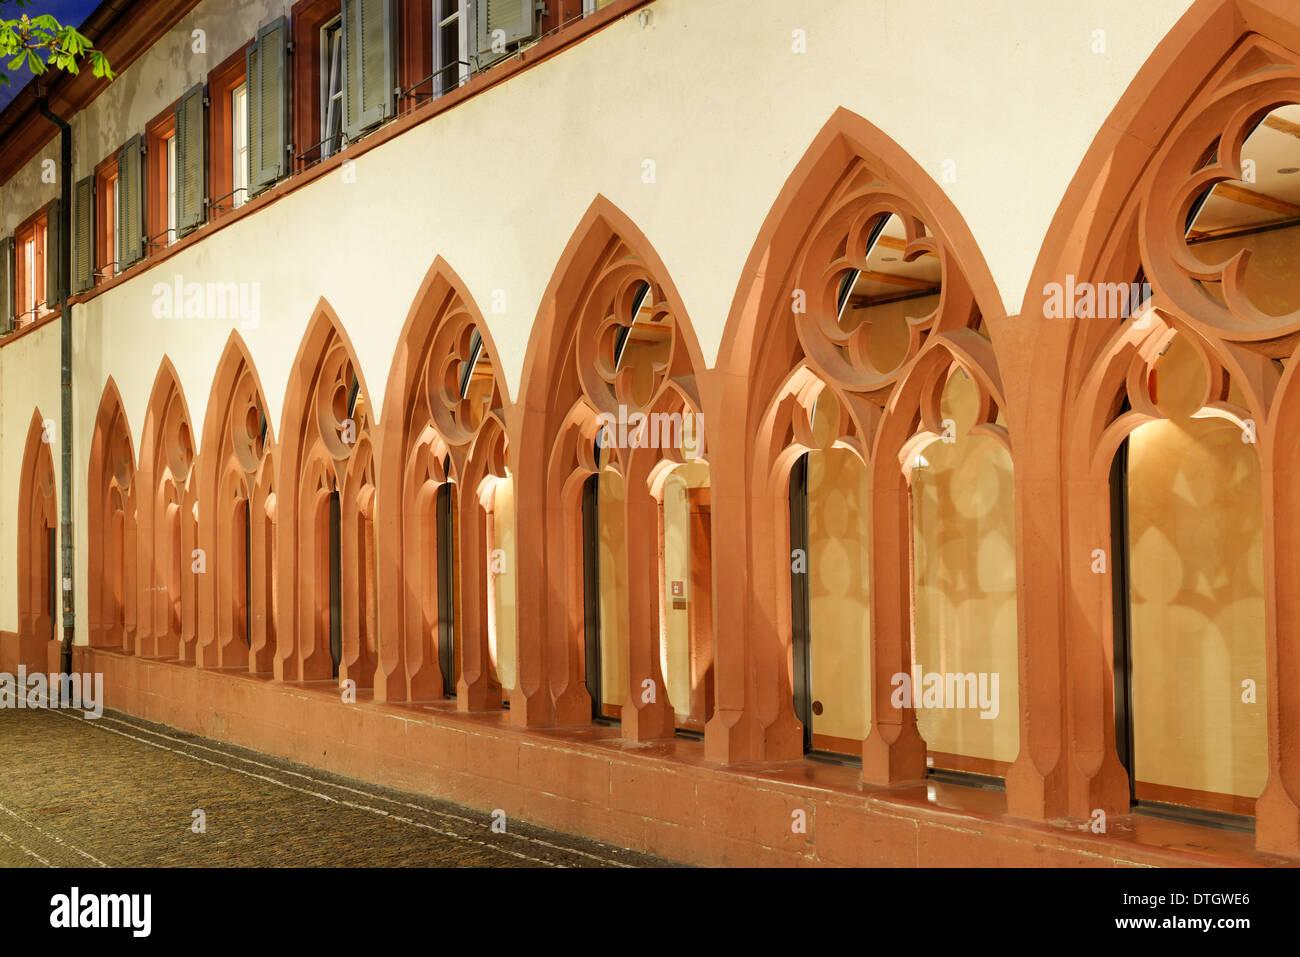 Cloister, Dominican monastery of St. Martin, Rathausplatz square, Freiburg im Breisgau, Baden-Württemberg, Germany - Stock Image